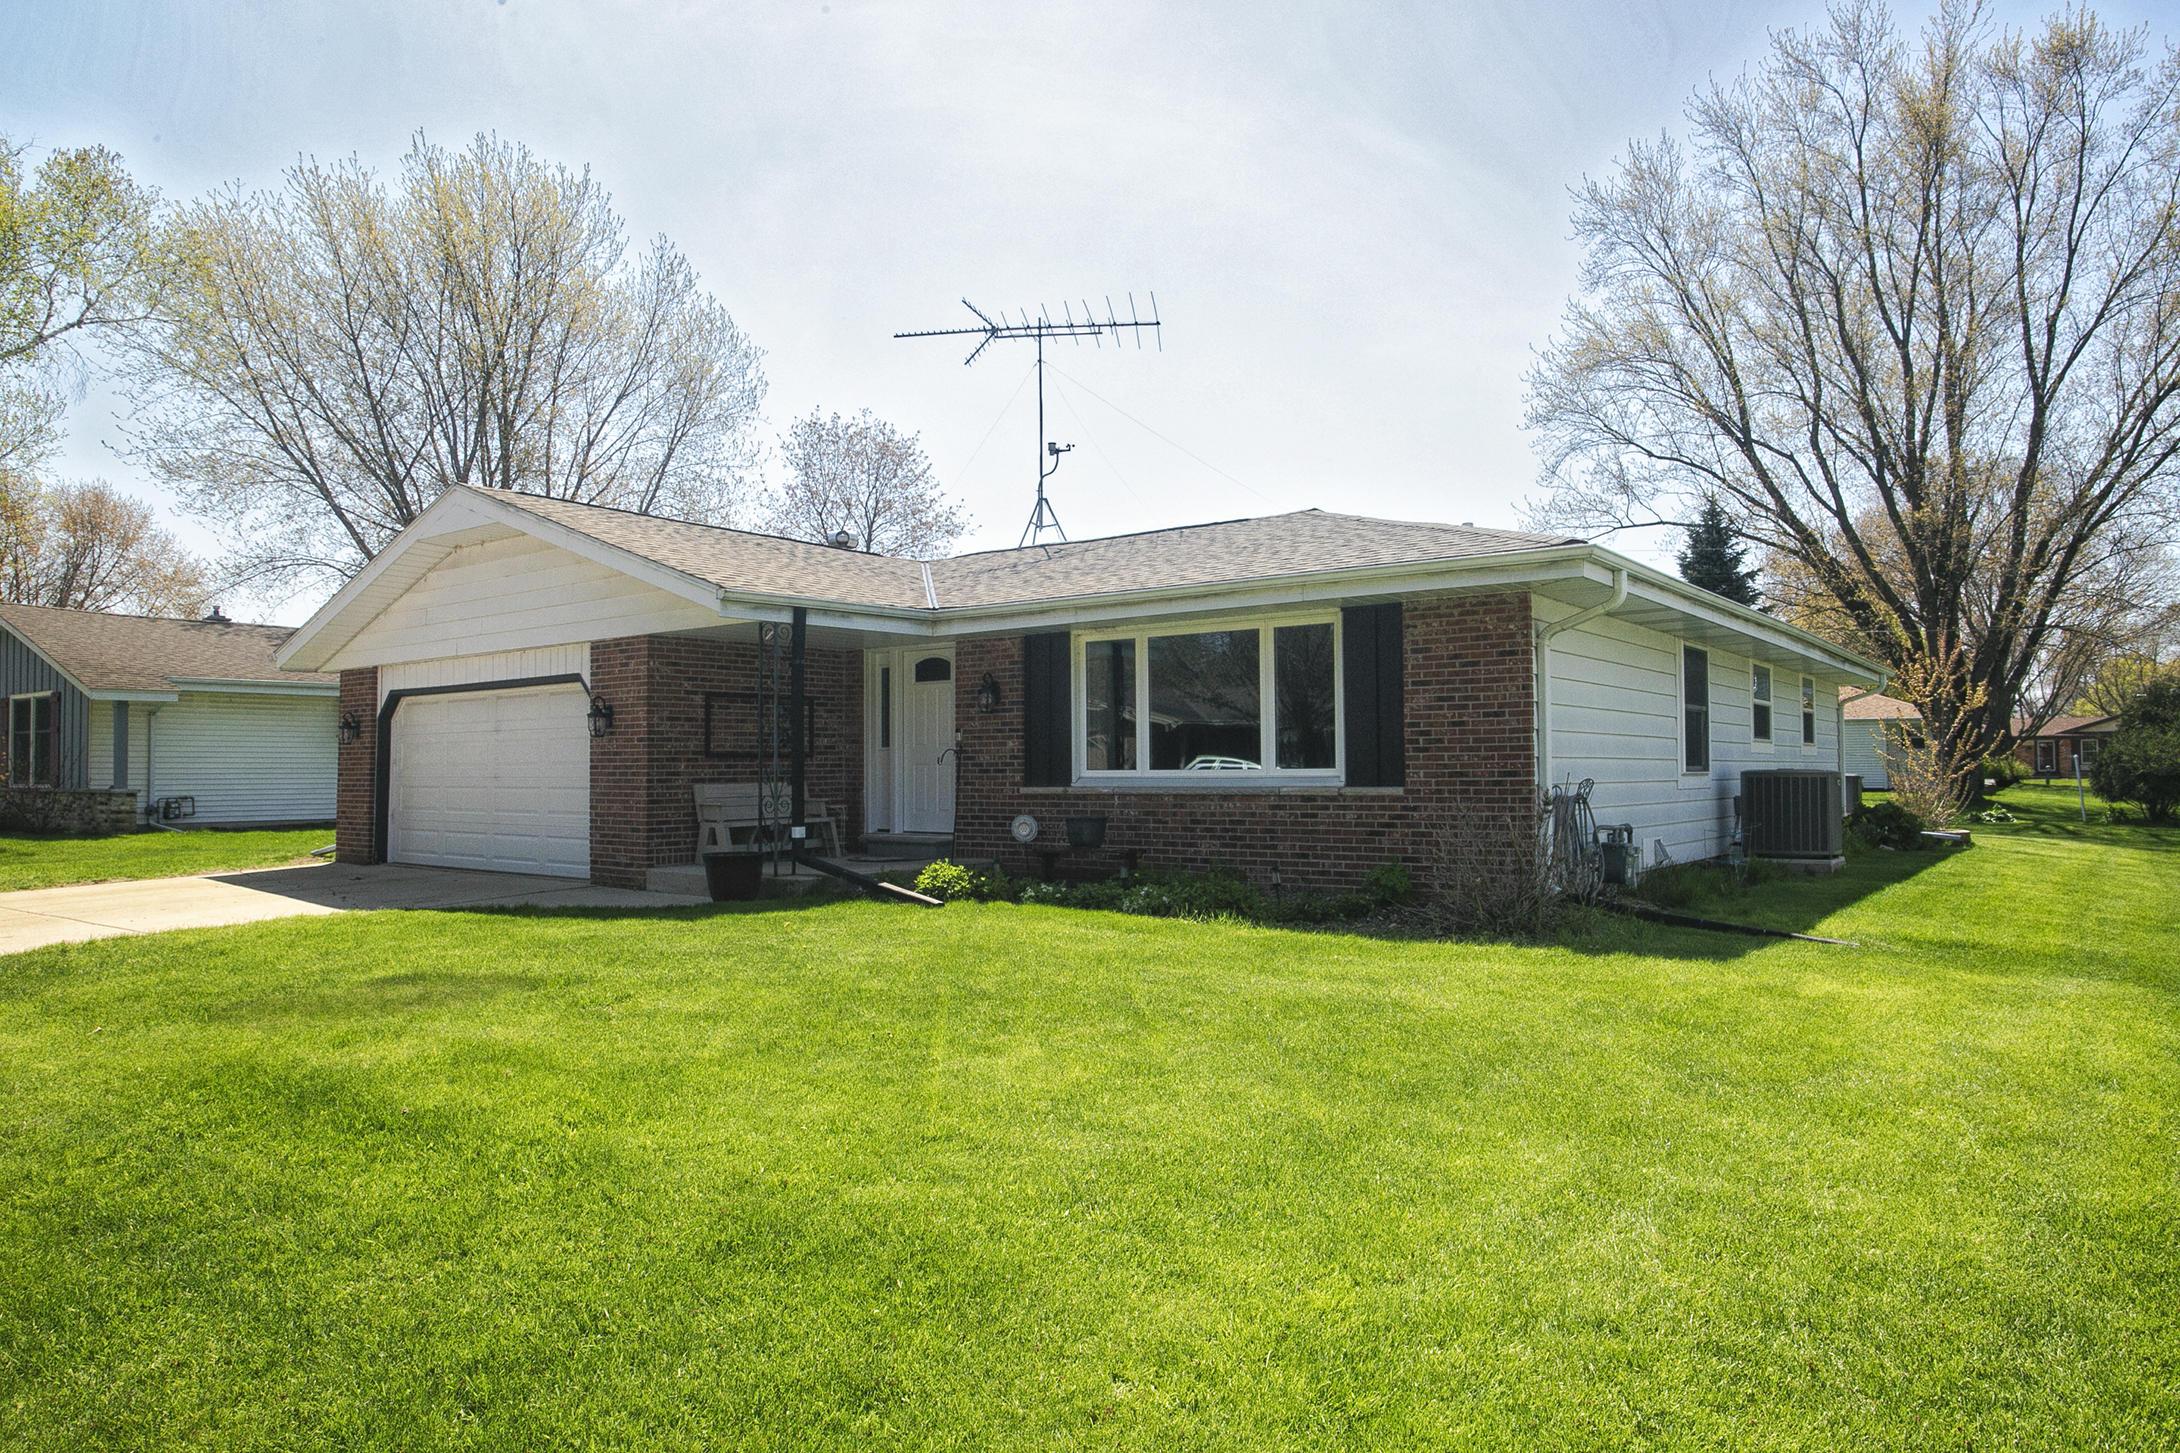 1131 Wisteria Ln, Waukesha, Wisconsin 53189, 3 Bedrooms Bedrooms, ,2 BathroomsBathrooms,Single-Family,For Sale,Wisteria Ln,1689210